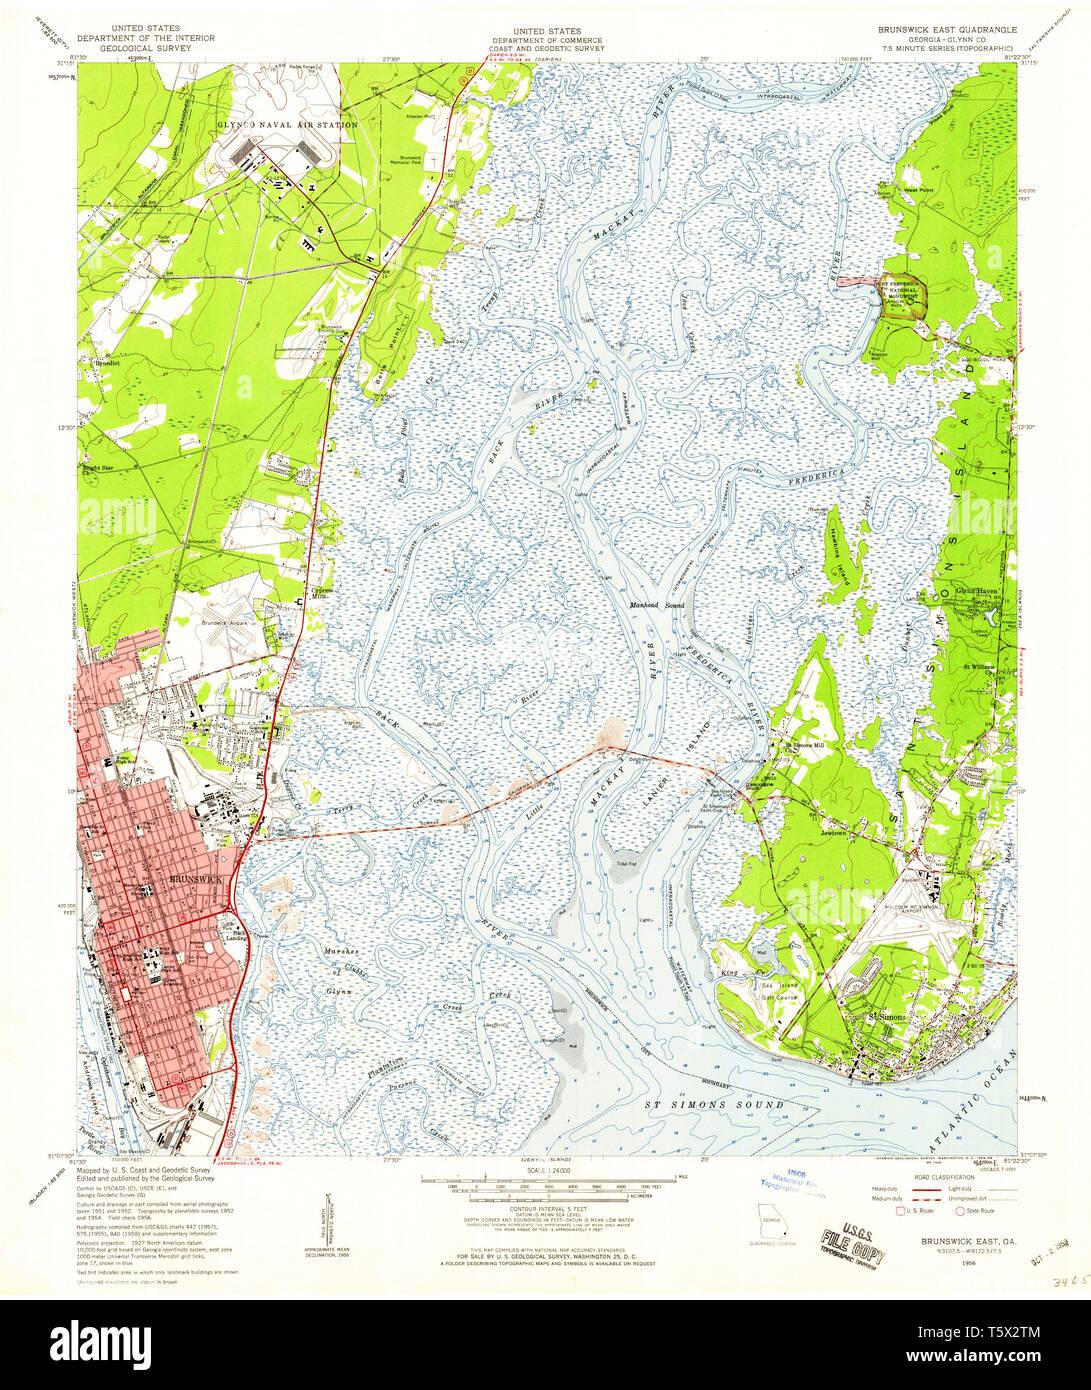 USGS TOPO Map Georgia GA Brunswick East 245136 1956 24000 ... Sc Ga Map on north carolina earthquake fault line map, ga co map, ga nv map, ga nc map, ga regions map, ga district map, ga tn map, ga elevation map, ga state map, ga fl map, ga interstate map, ga road map, georgia and florida road map, athens ga map, ga al map, ga st map, south carolina map, south ga cities map, ga rivers map, ga ala map,